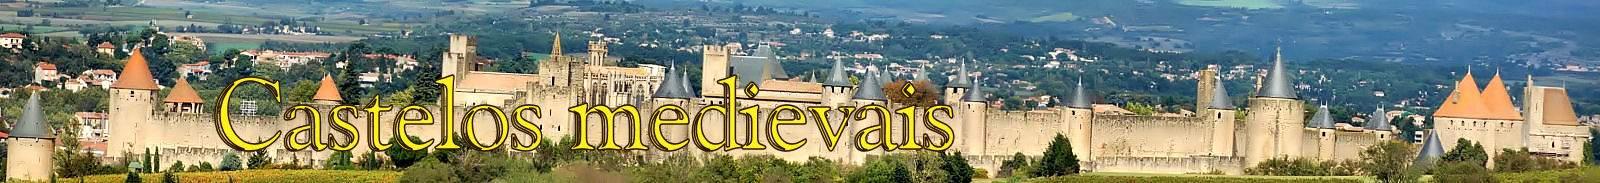 Castelos medievais